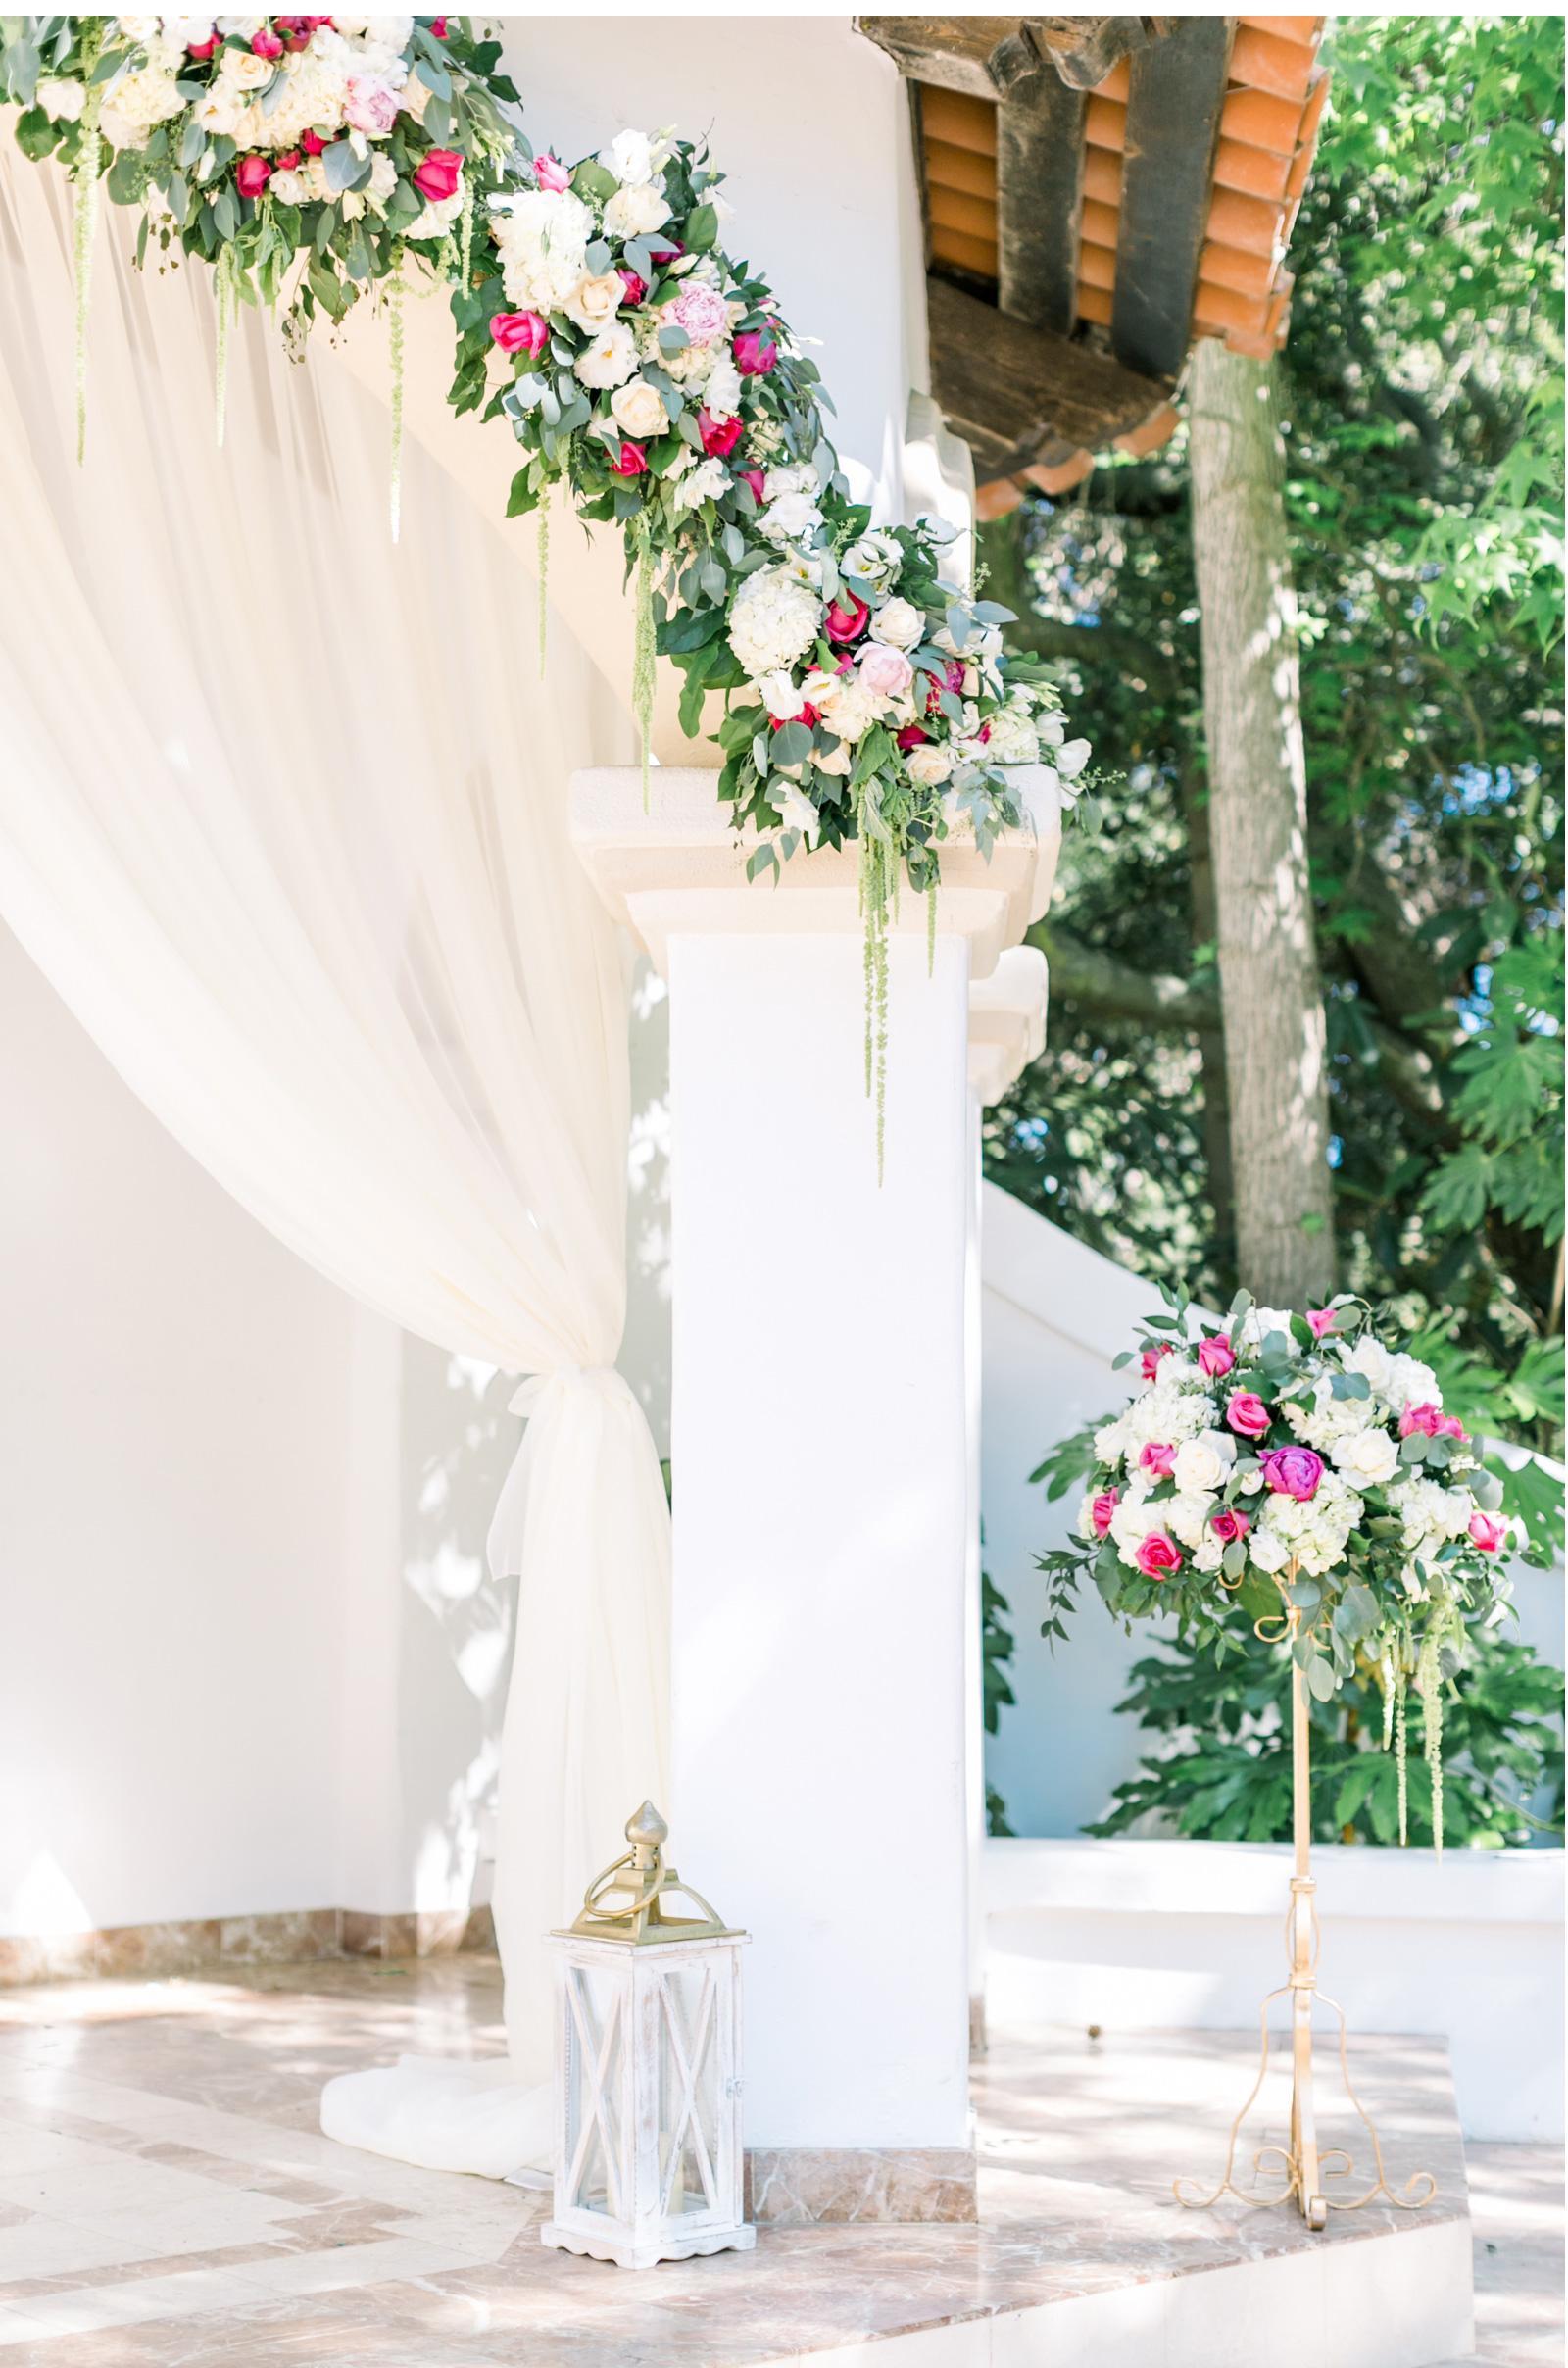 Malibu-Classic-Wedding-Style-Me-Pretty-Natalie-Schutt-Photography_10.jpg